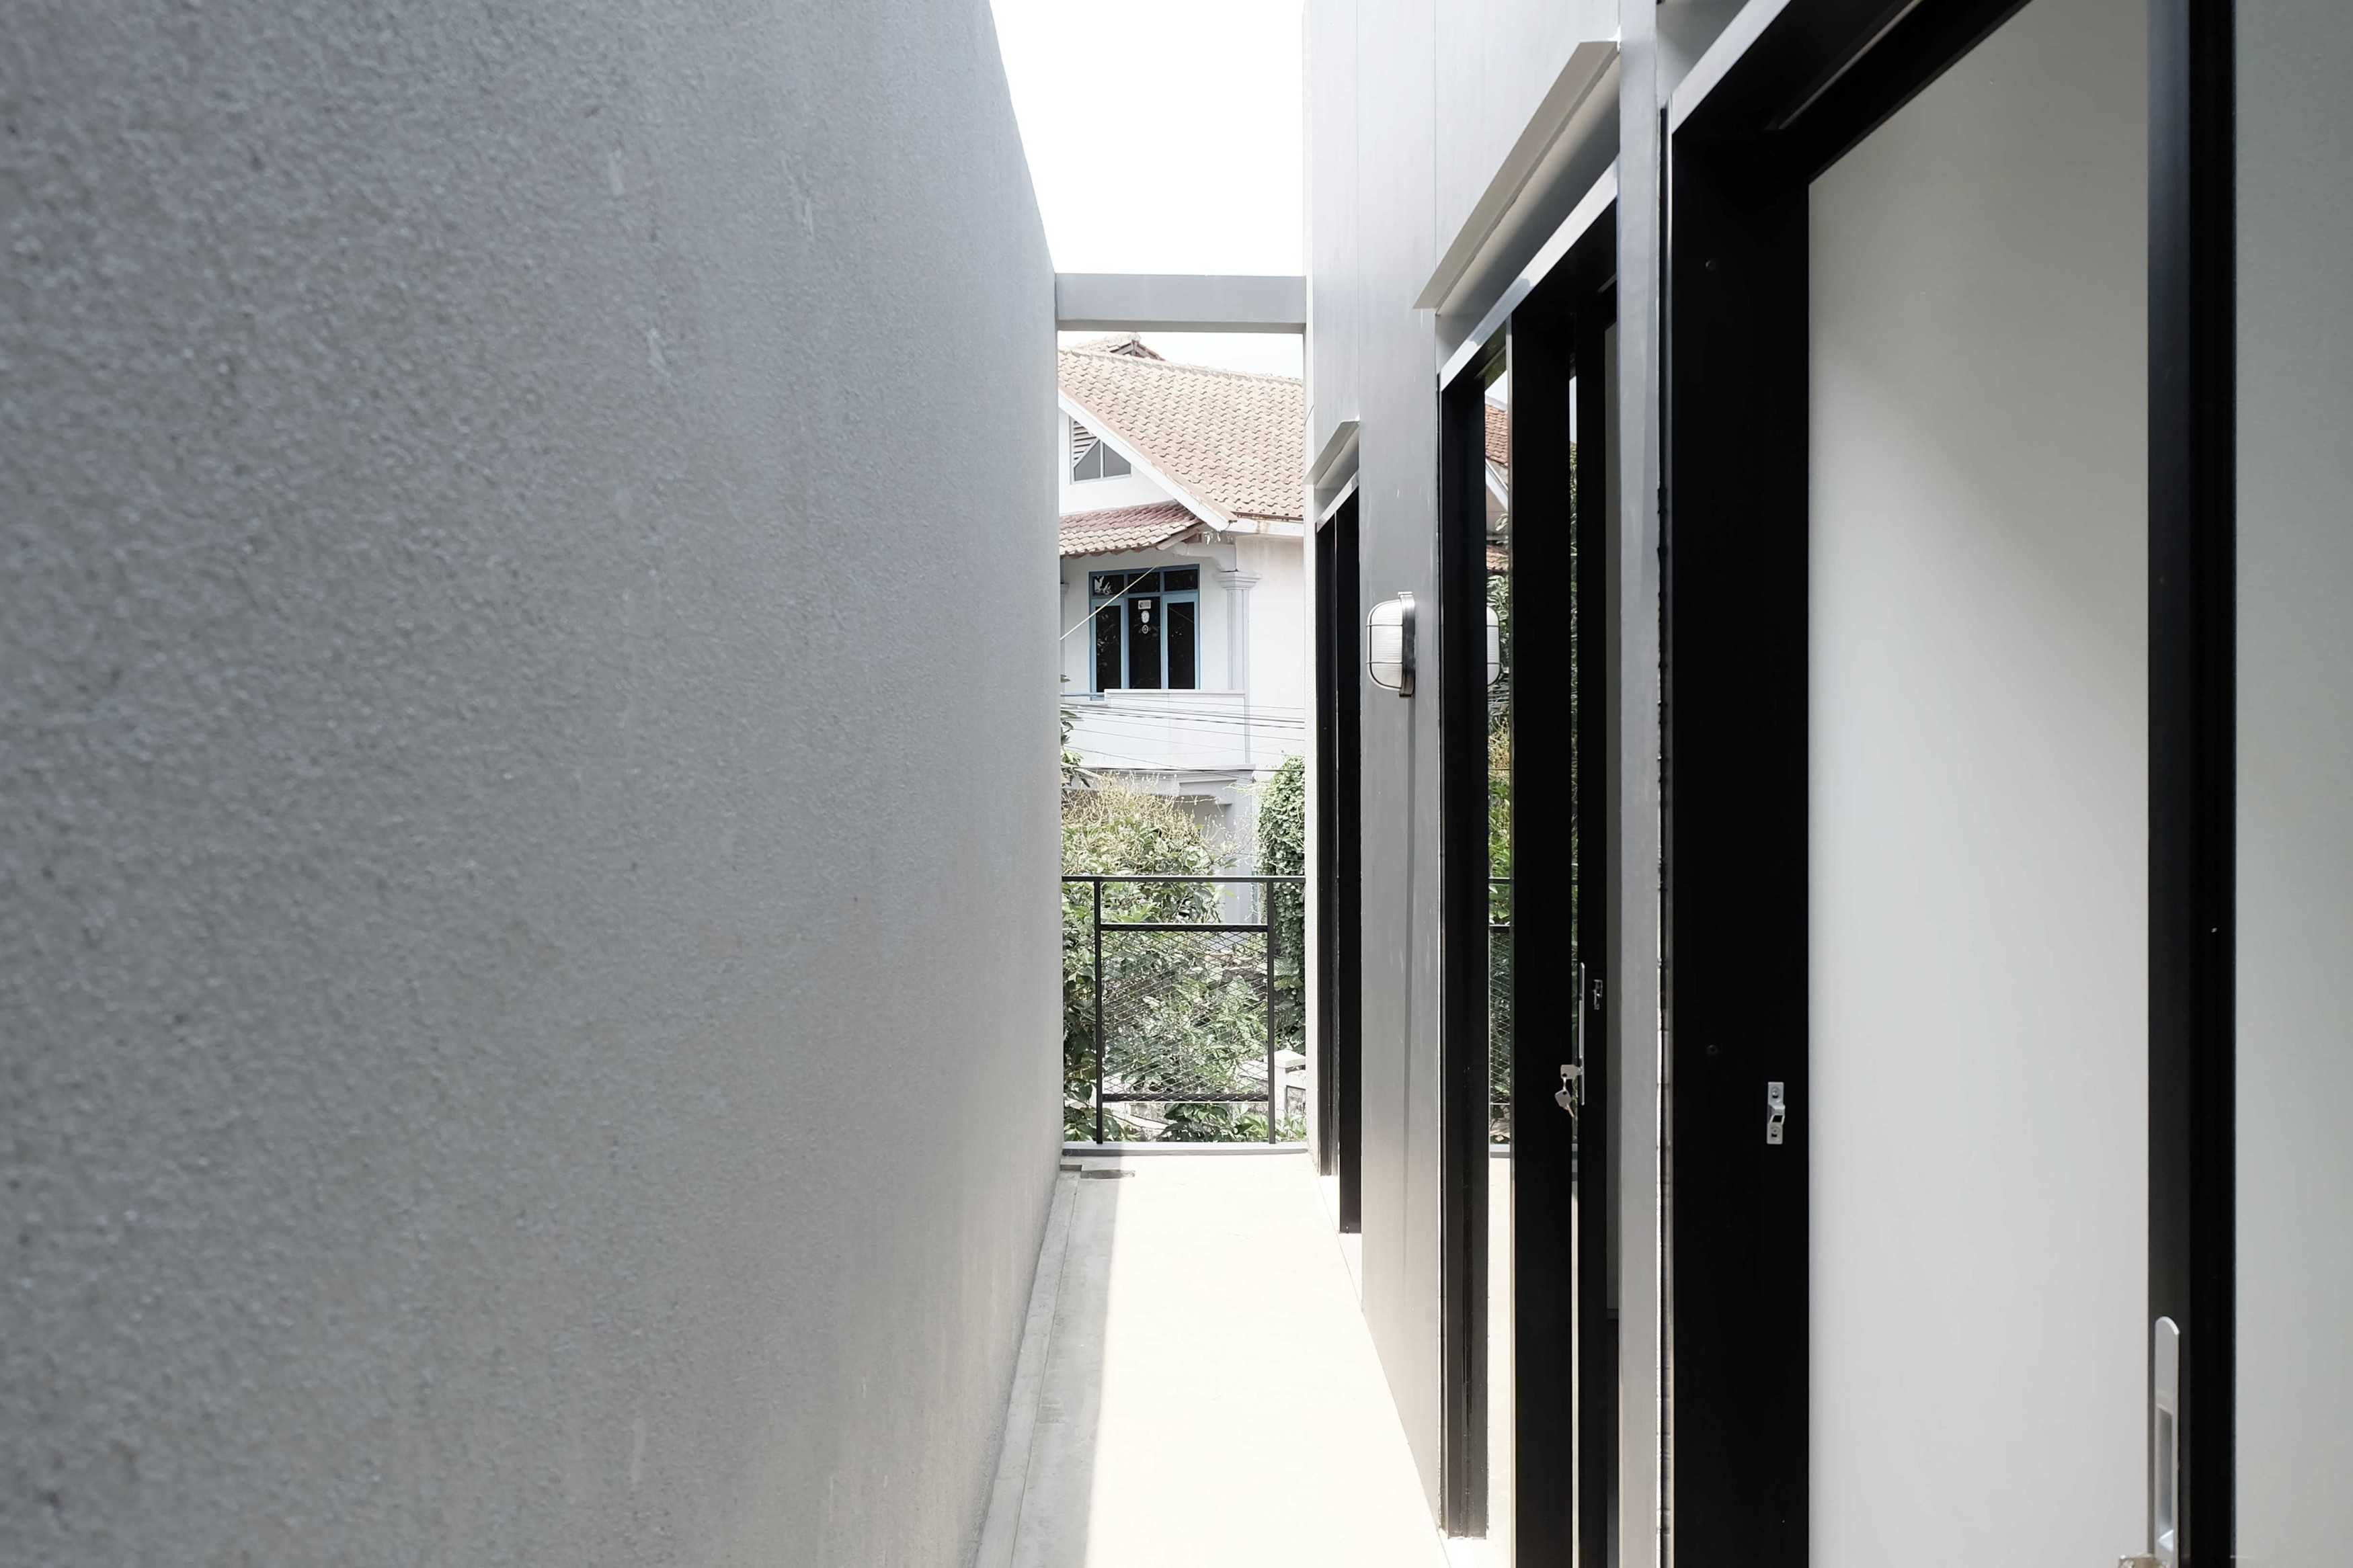 Dica Selaras Yang House Bandung, Kota Bandung, Jawa Barat, Indonesia Bandung, Kota Bandung, Jawa Barat, Indonesia Dica-Selaras-Yang-House   62835